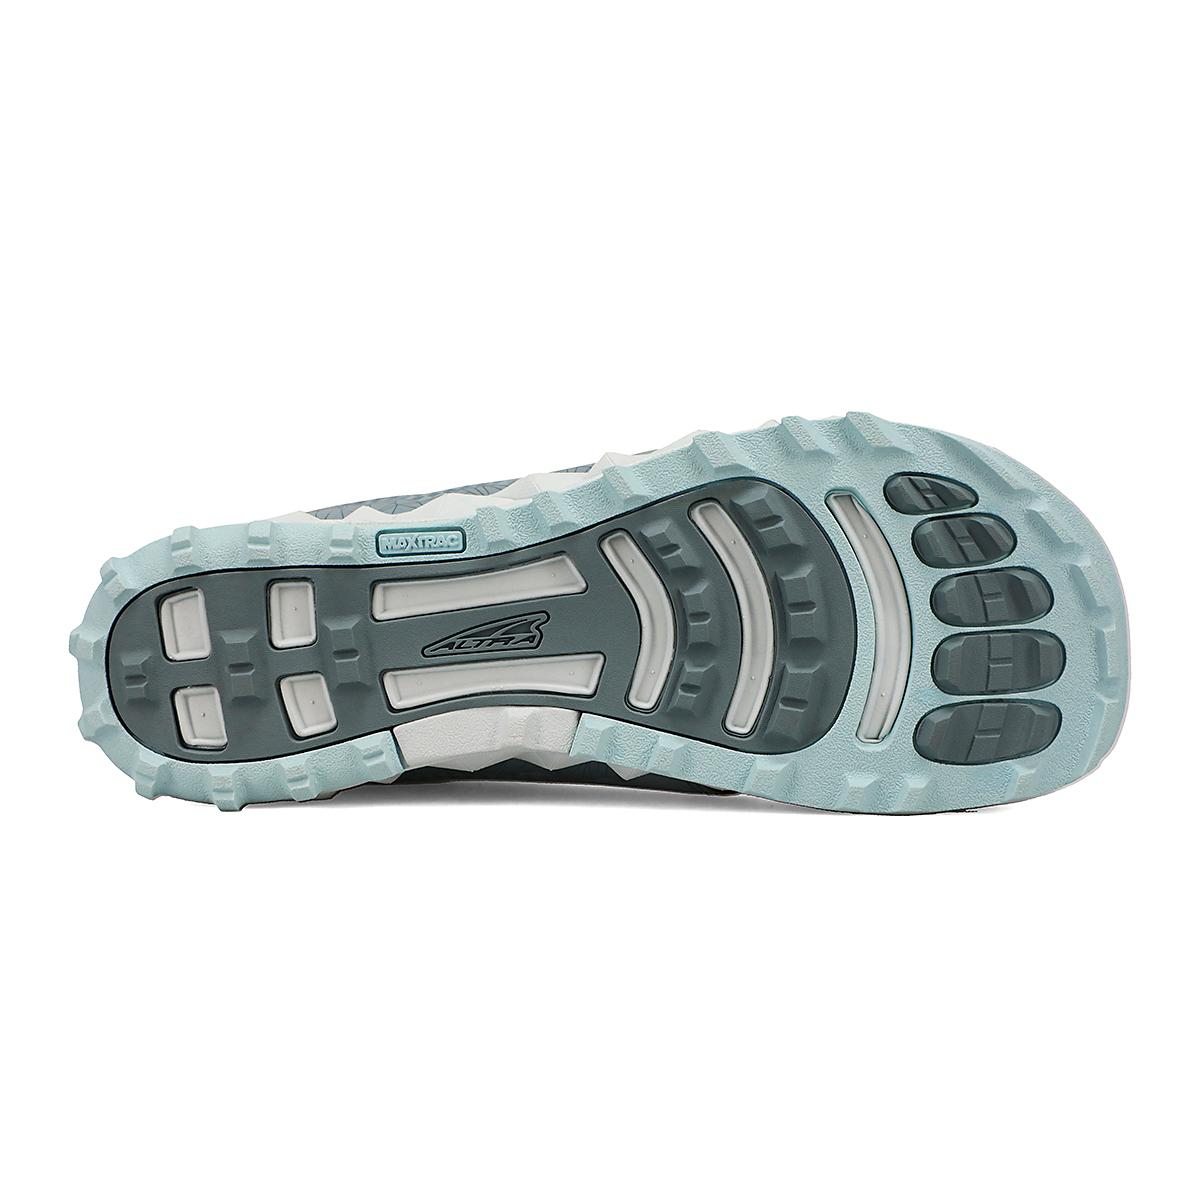 Women's Altra Superior 4.5 Trail Running Shoe - Color: Light Blue - Size: 5.5 - Width: Regular, Light Blue, large, image 3